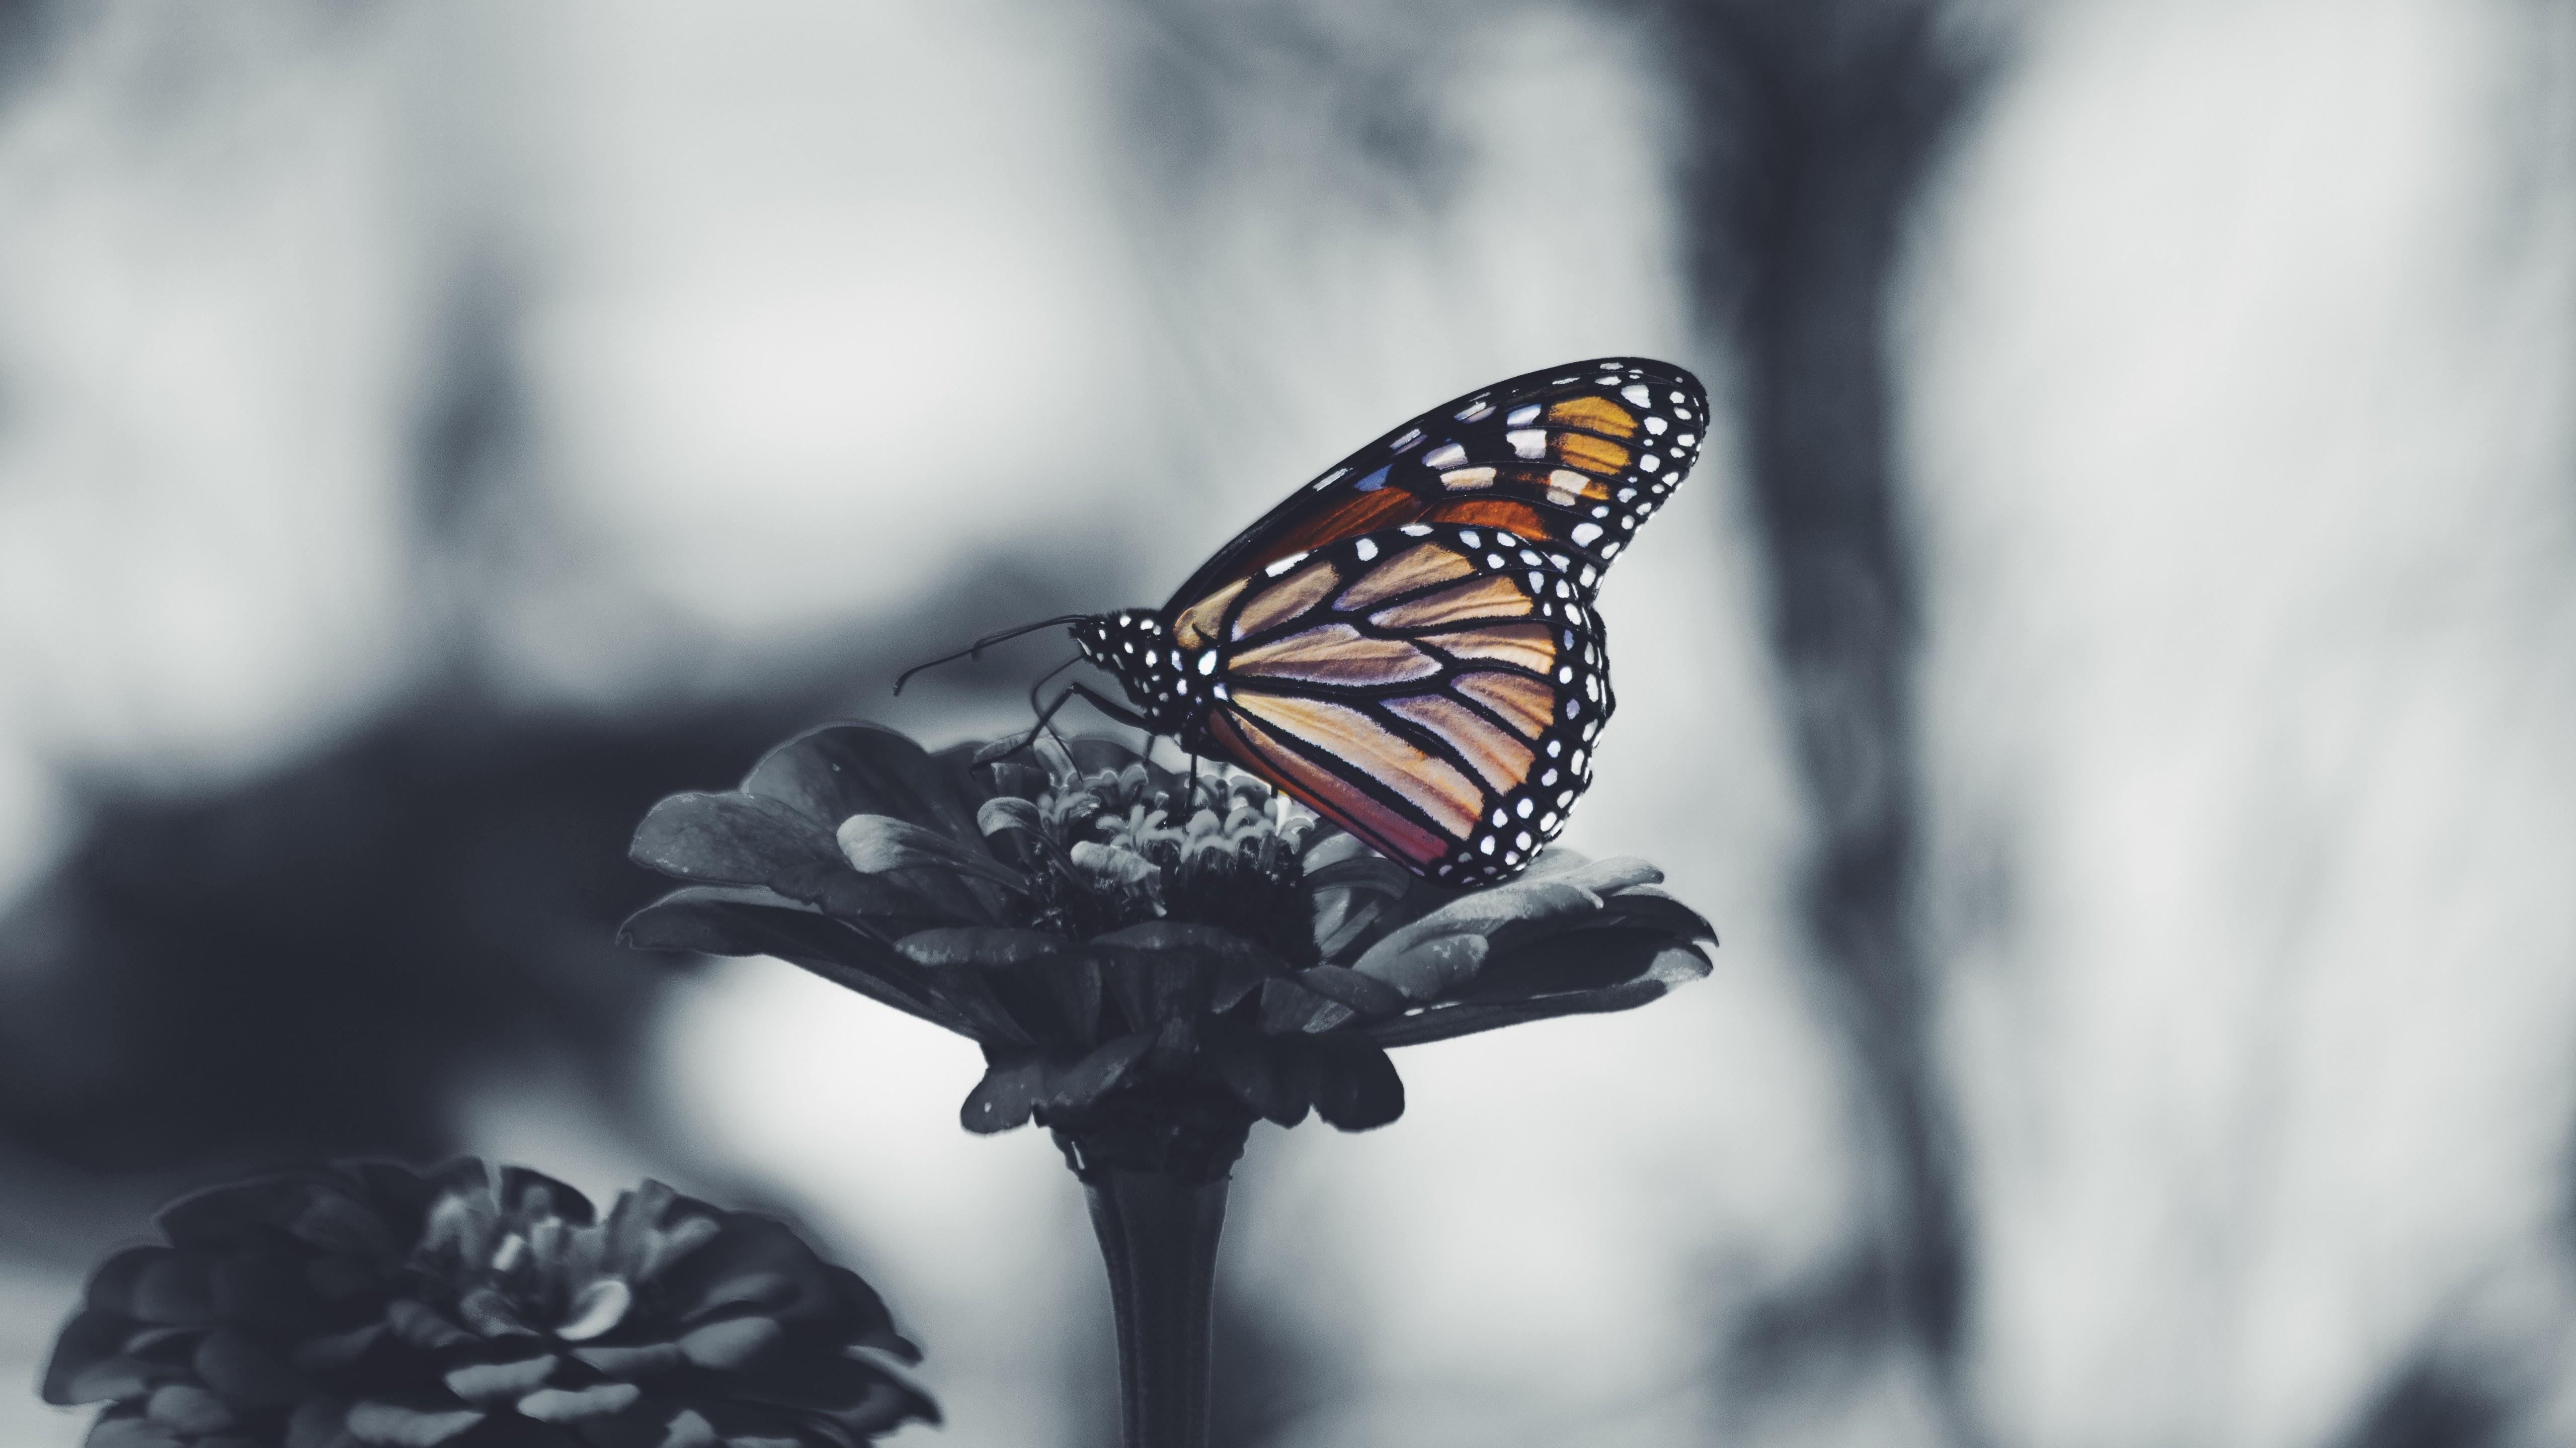 Butterfly 5k Black And White Desktop Background Wallpaper - Butterflies Depression , HD Wallpaper & Backgrounds